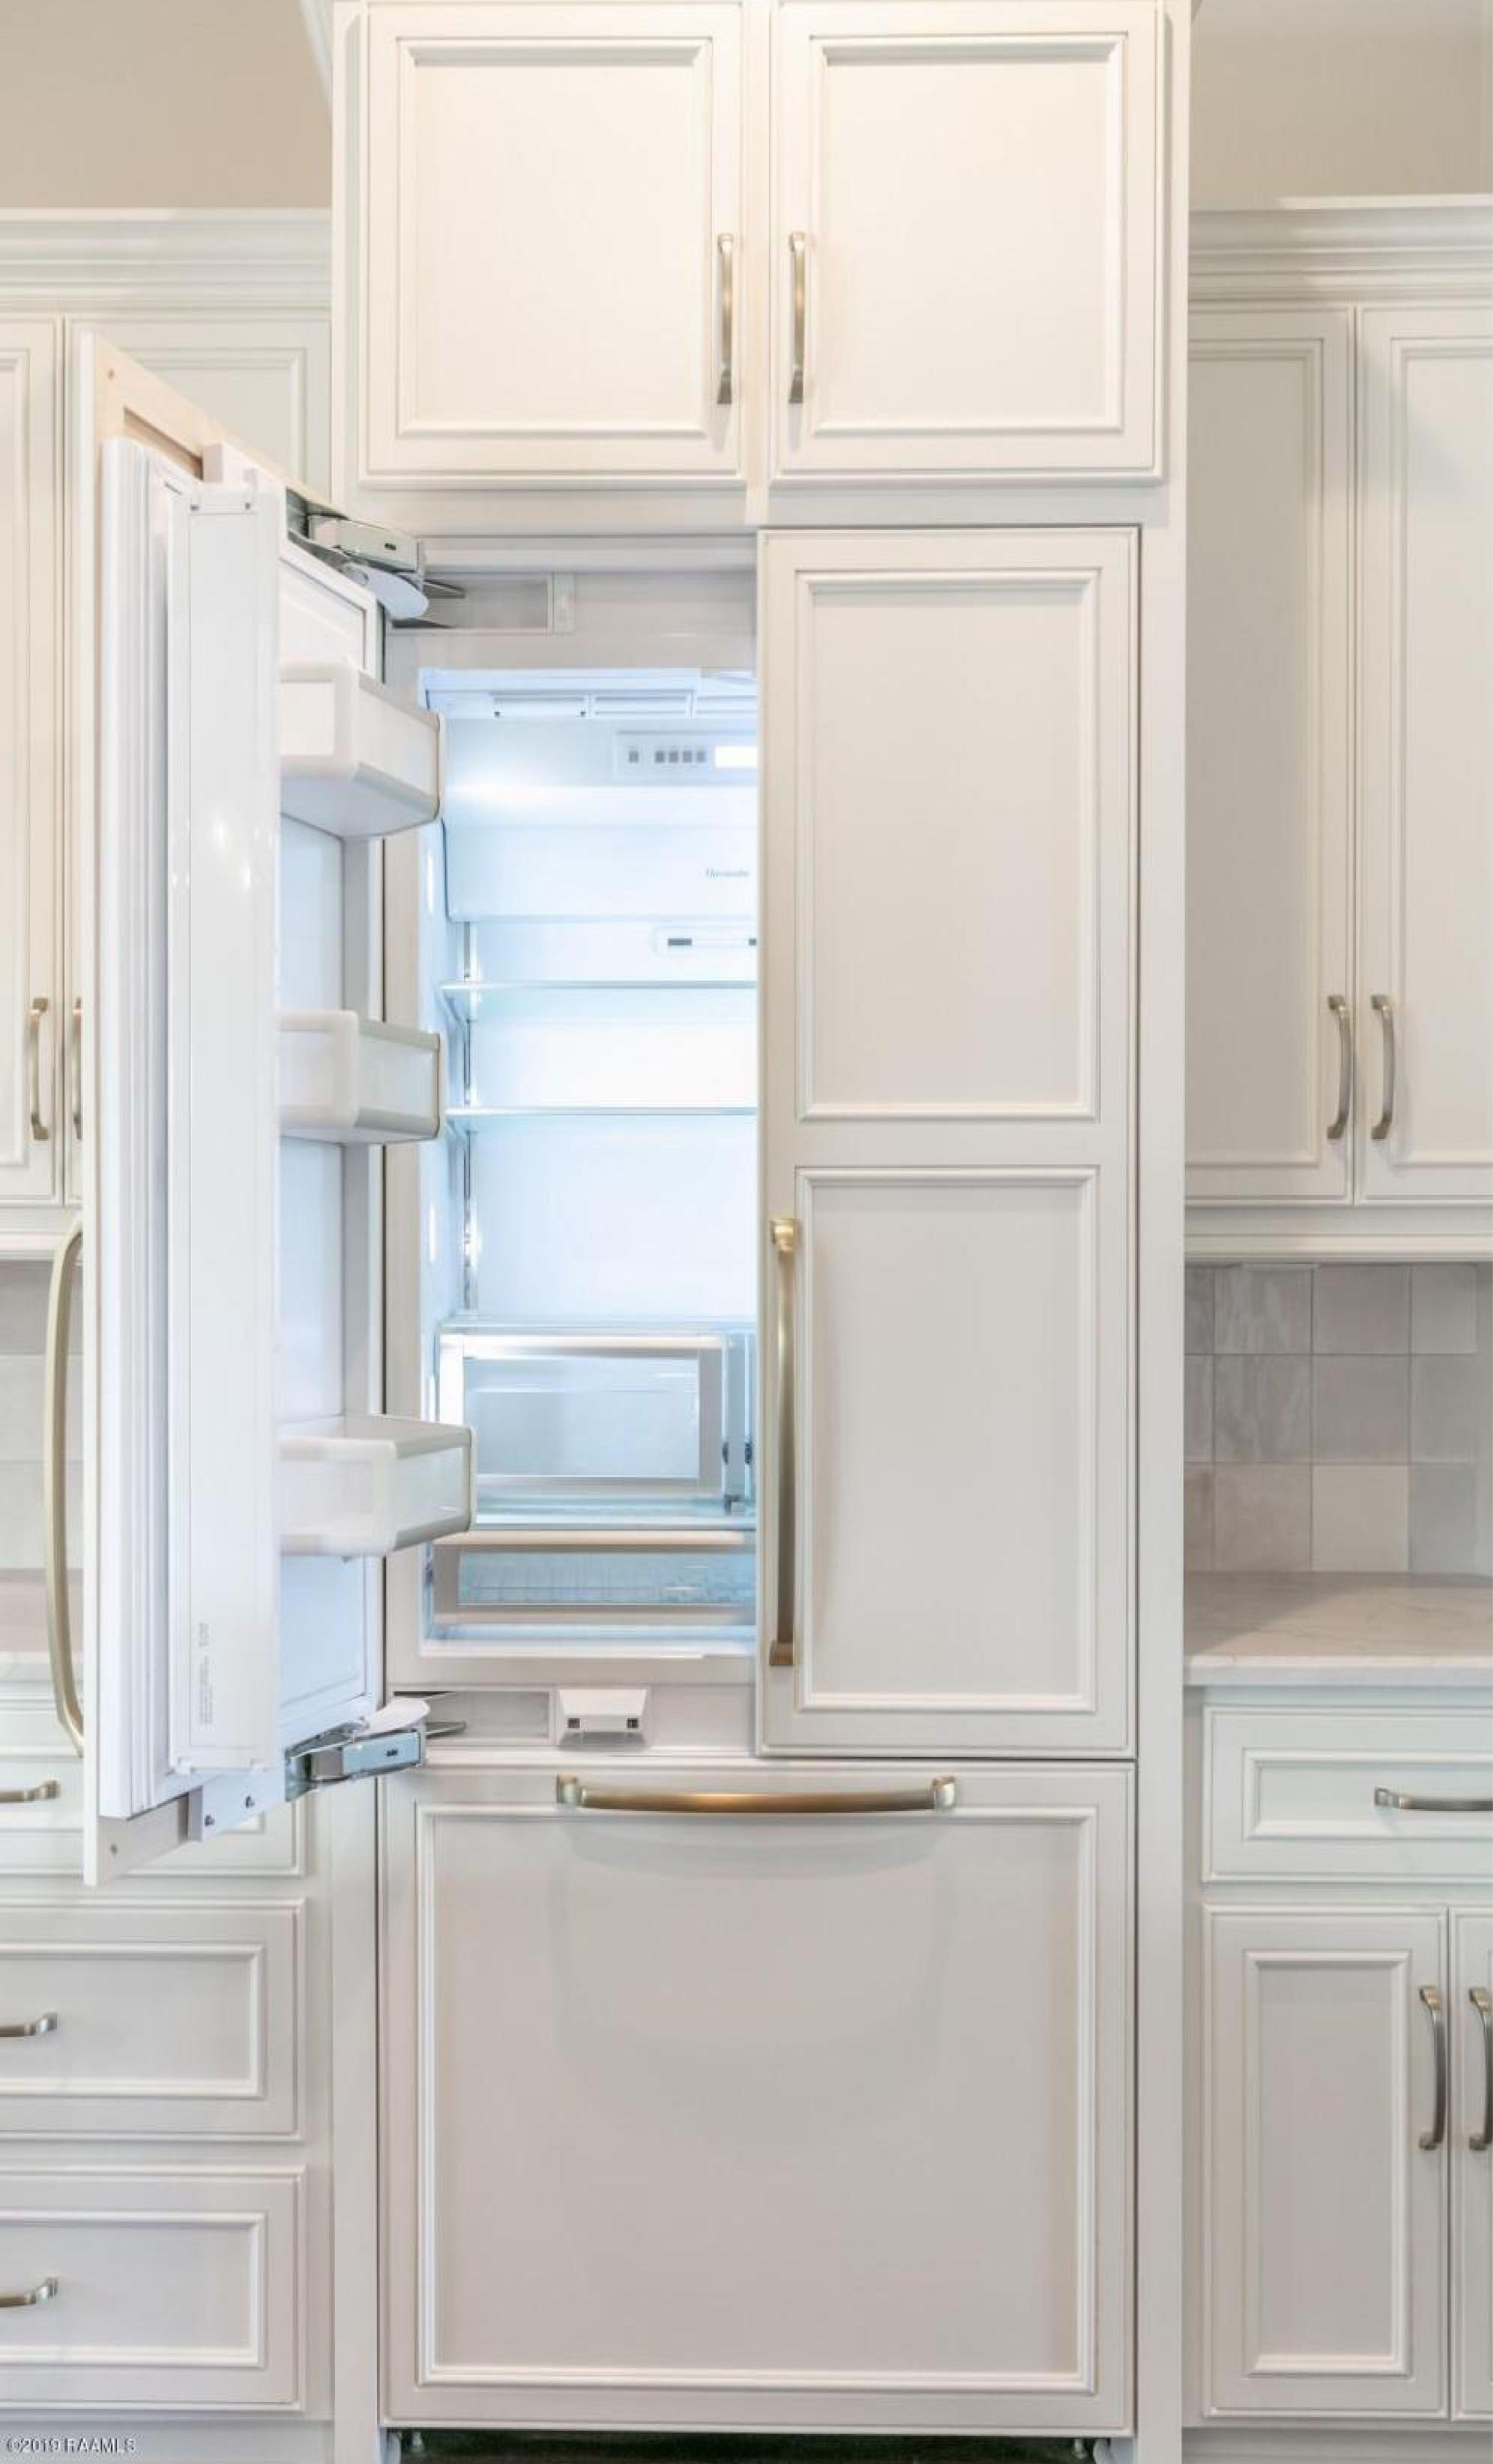 Custom Panel Fridge Inside Kitchen Cabinets Farmhouse Kitchen Design Refrigerator Panels